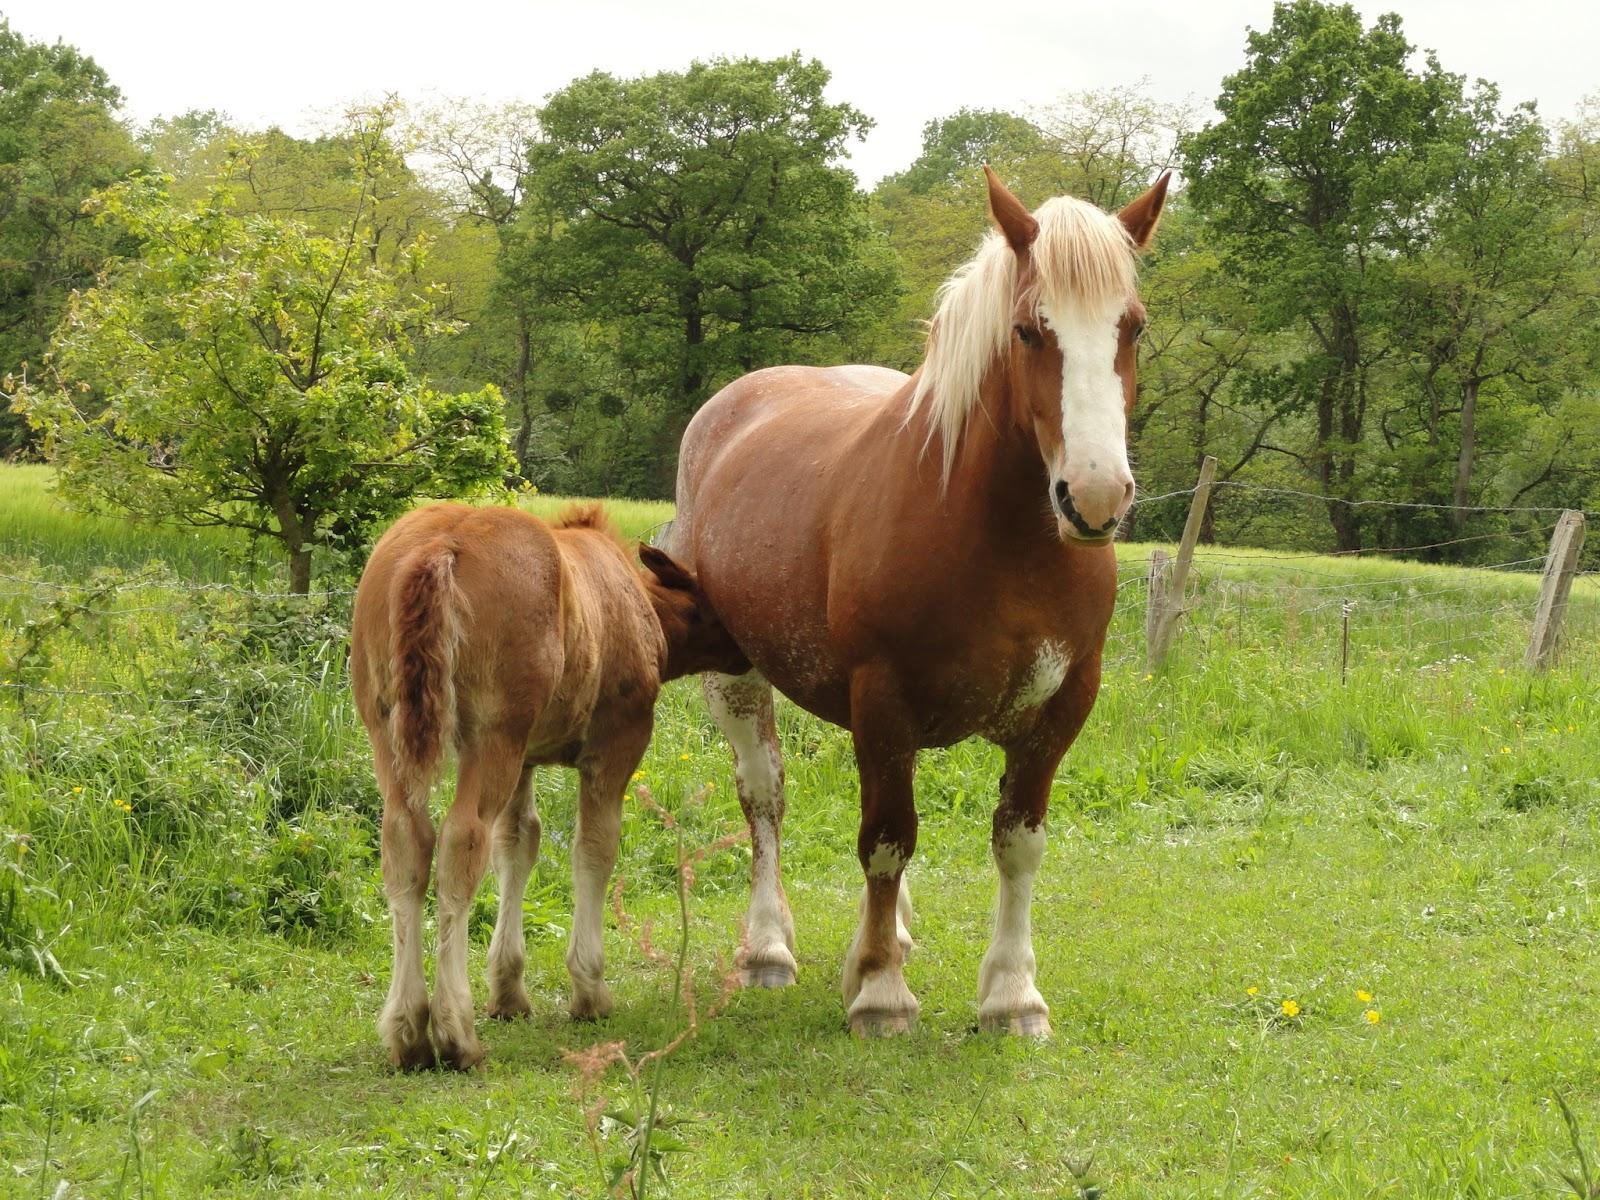 foals - photo #7